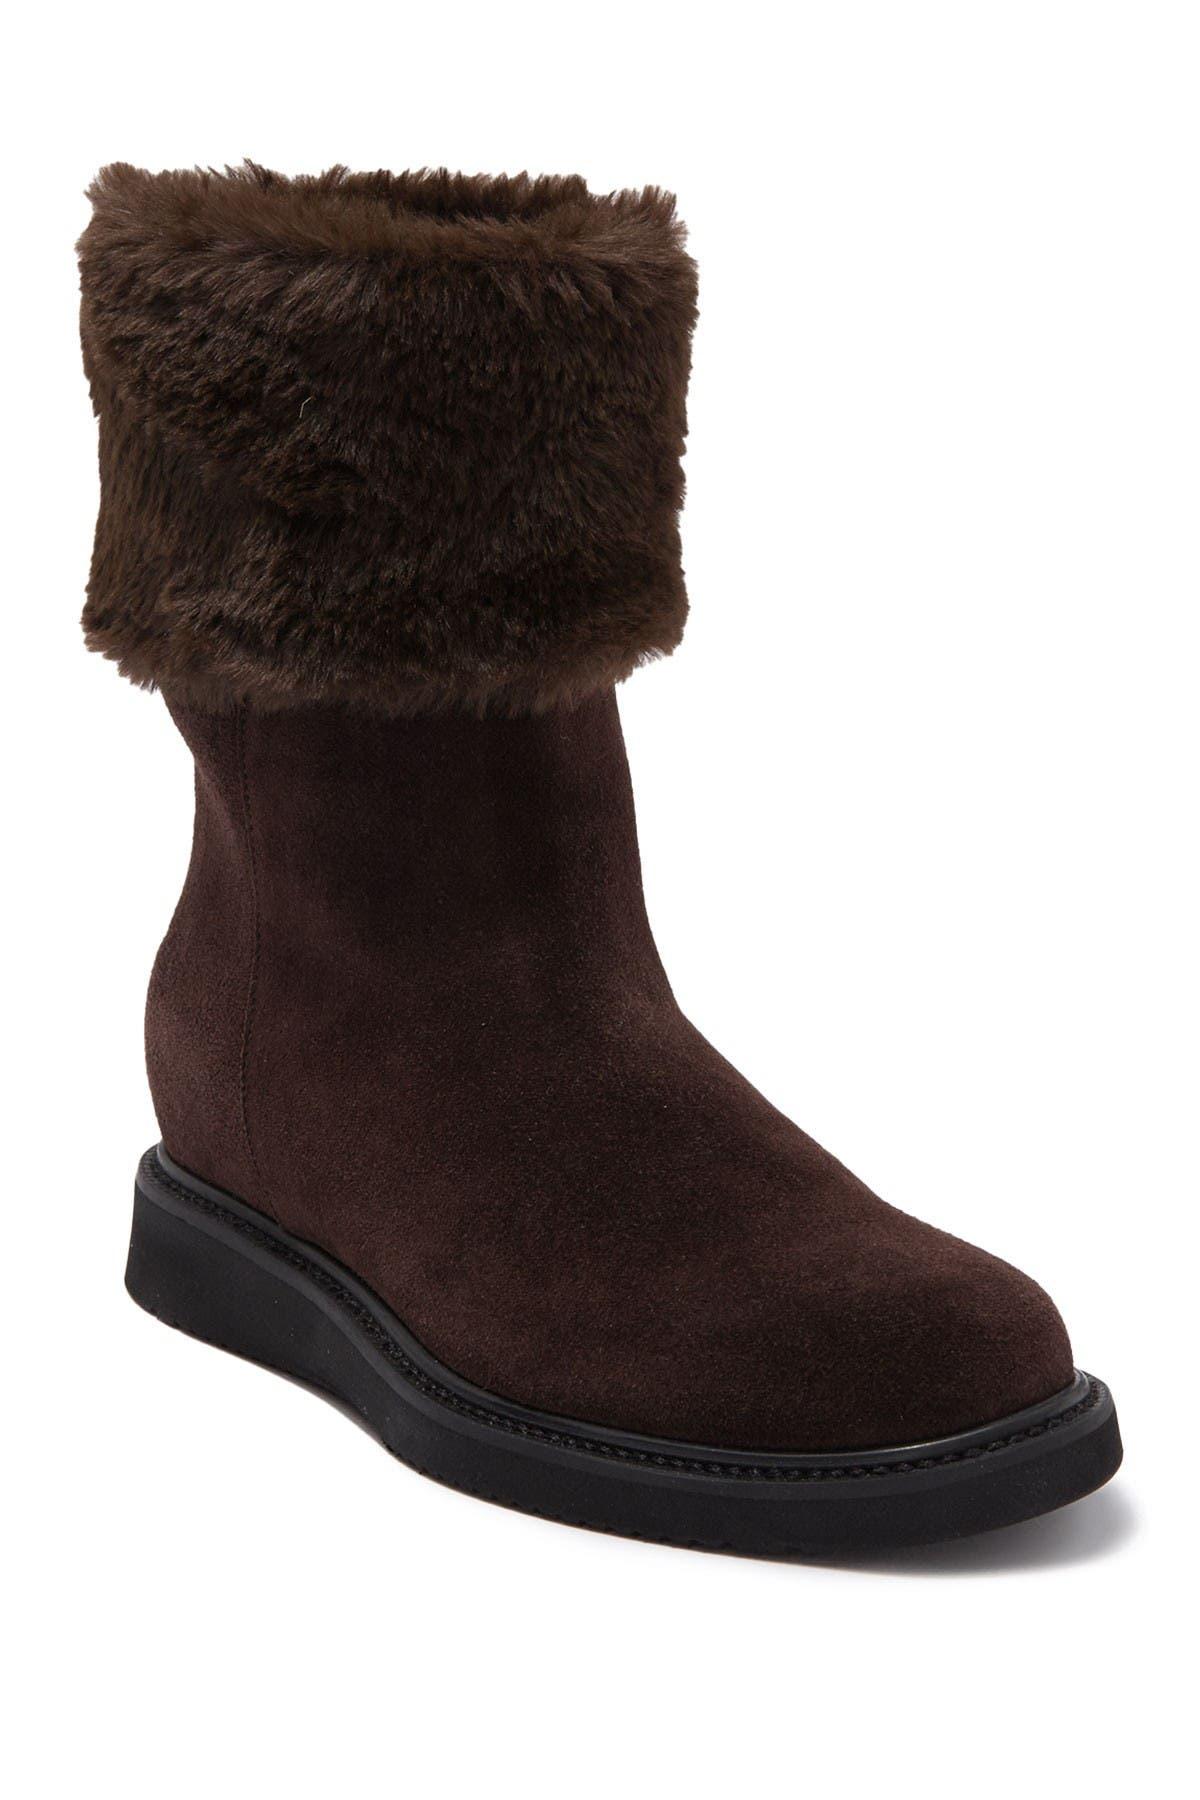 Image of Aquatalia Carlin Faux Fur Cuff Boot